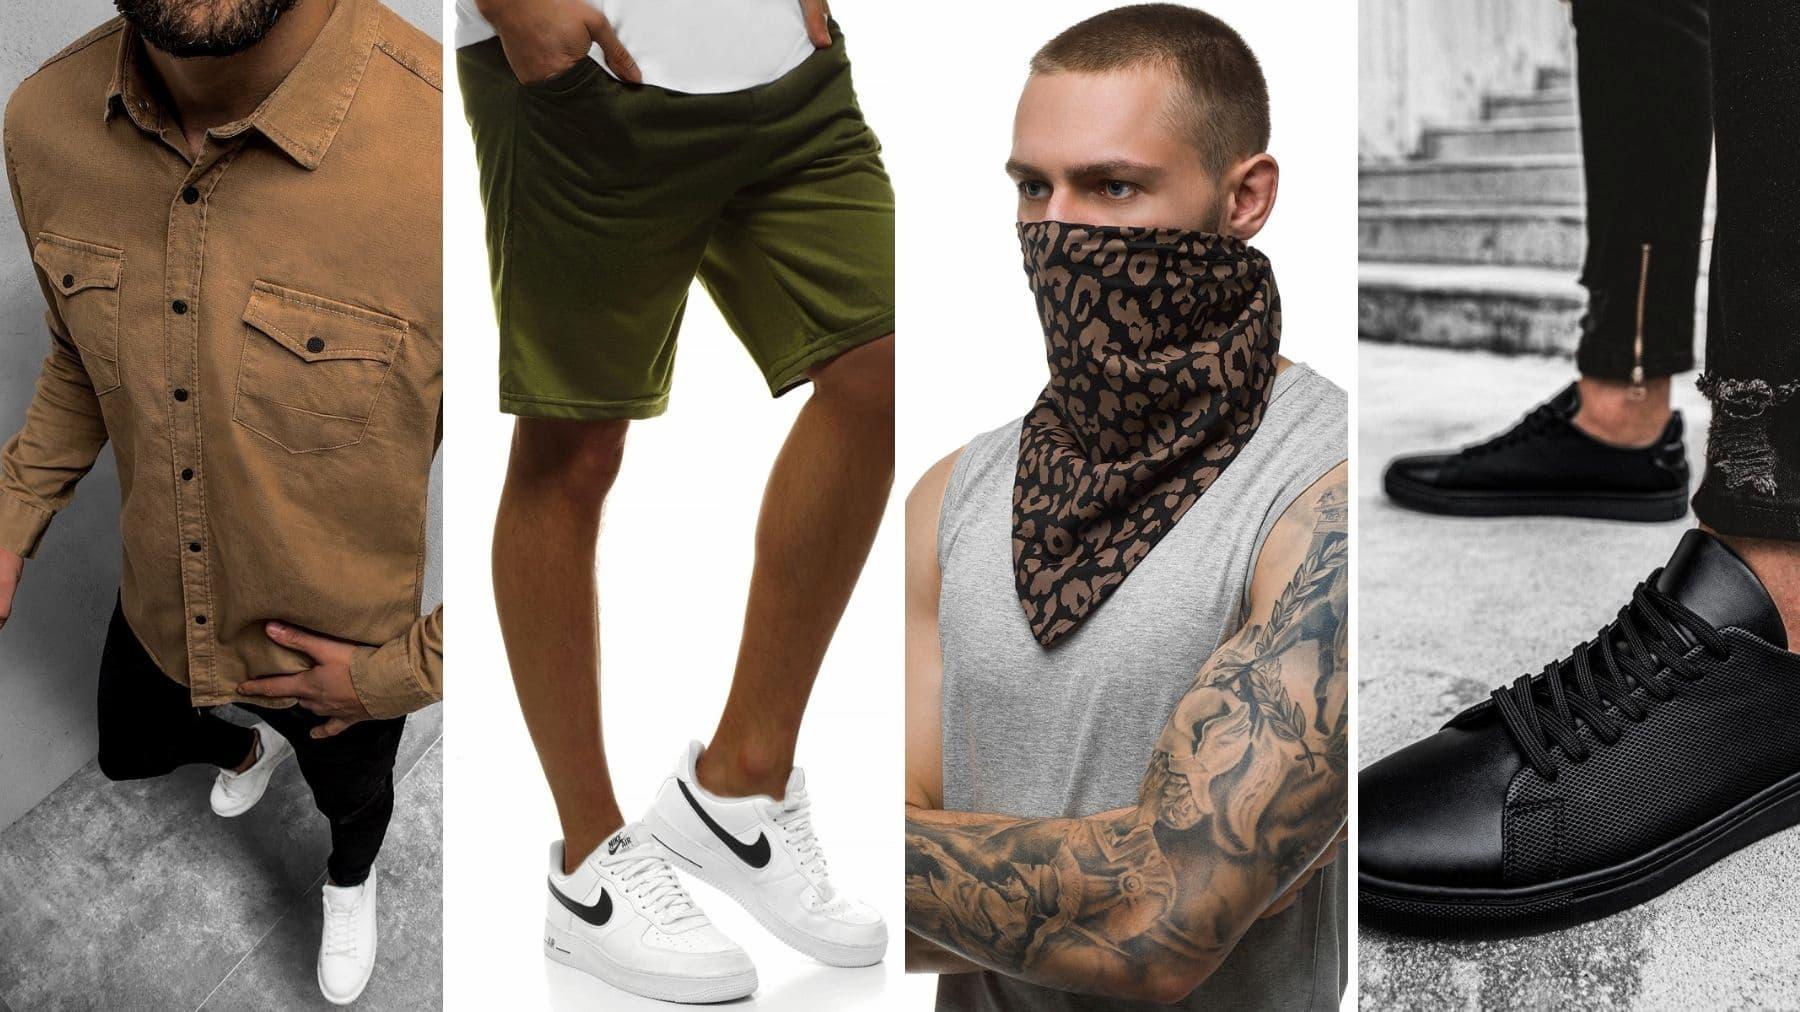 koszula męska beżowa ozonee, spodenki męskie ozonee, bandana męska ozonee, sneakersy czarne ozonee